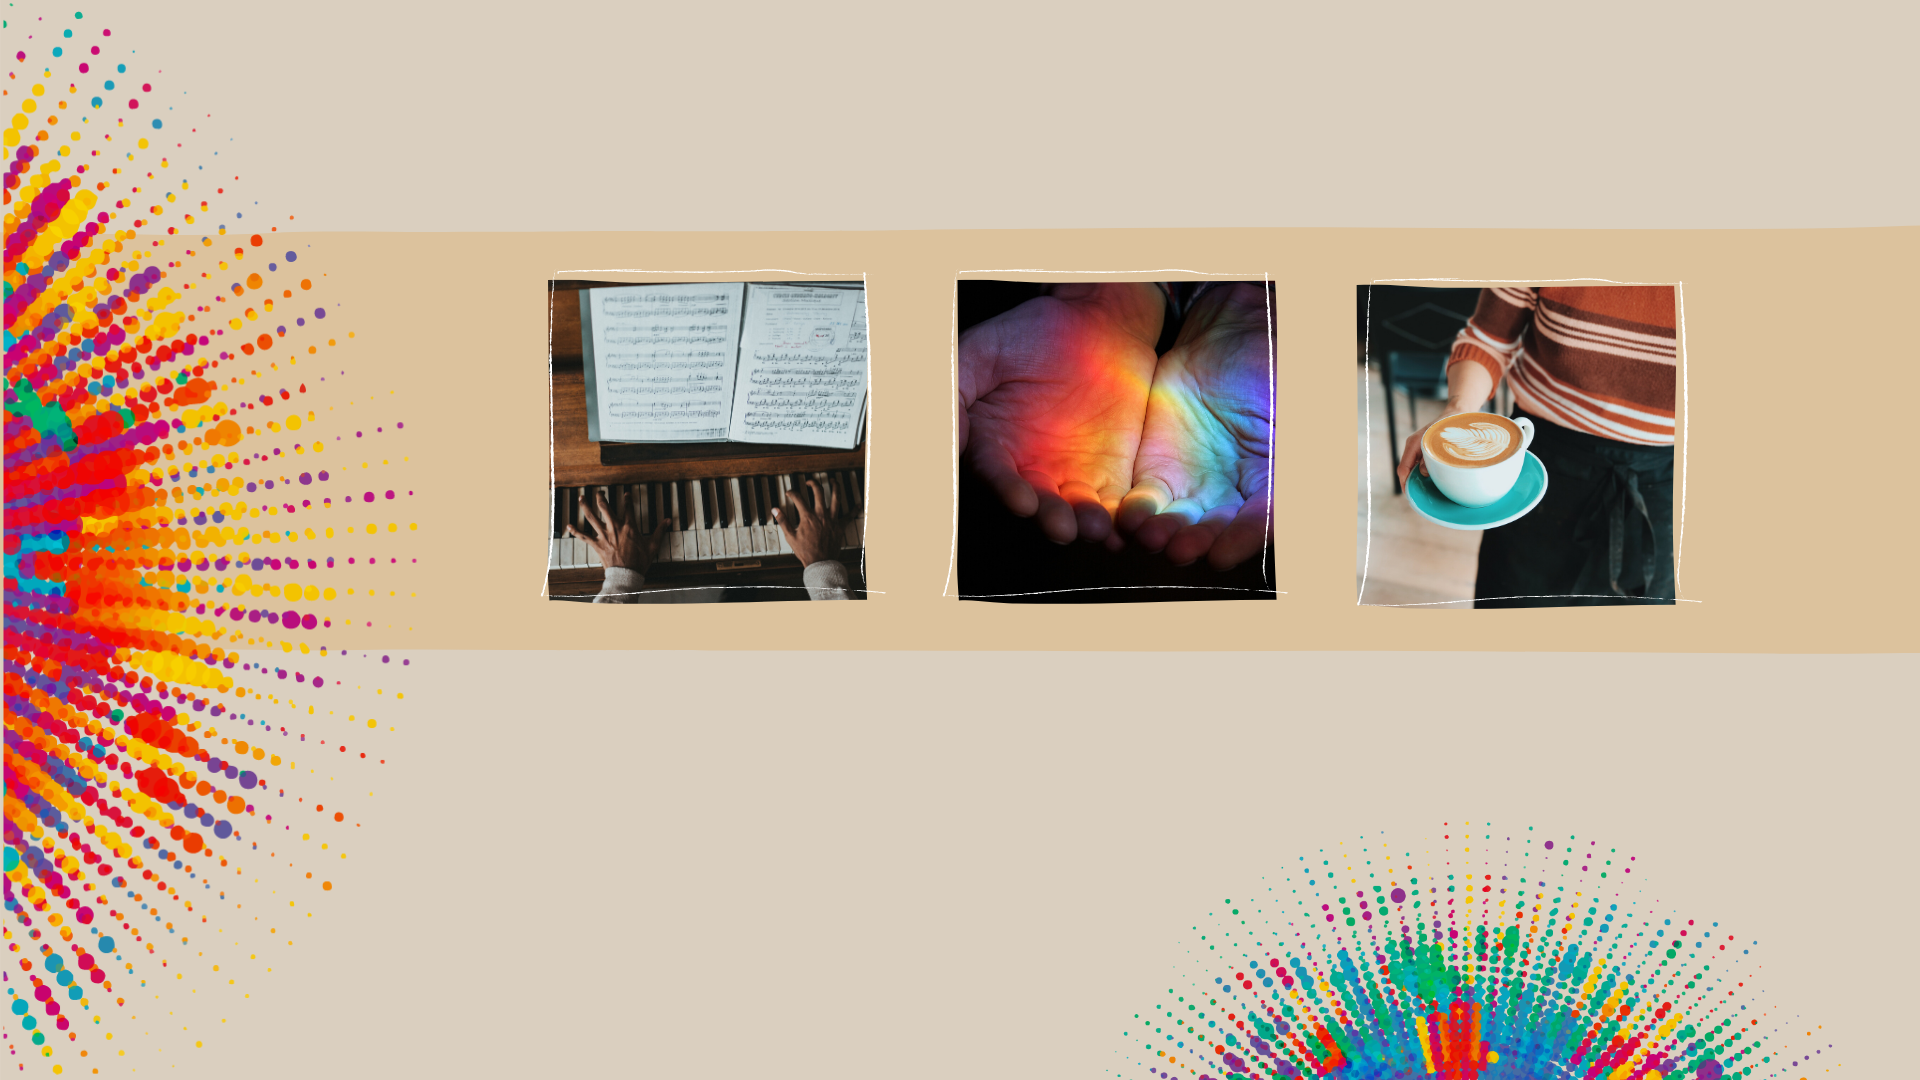 PowerPoint Keynote Slide - Photos